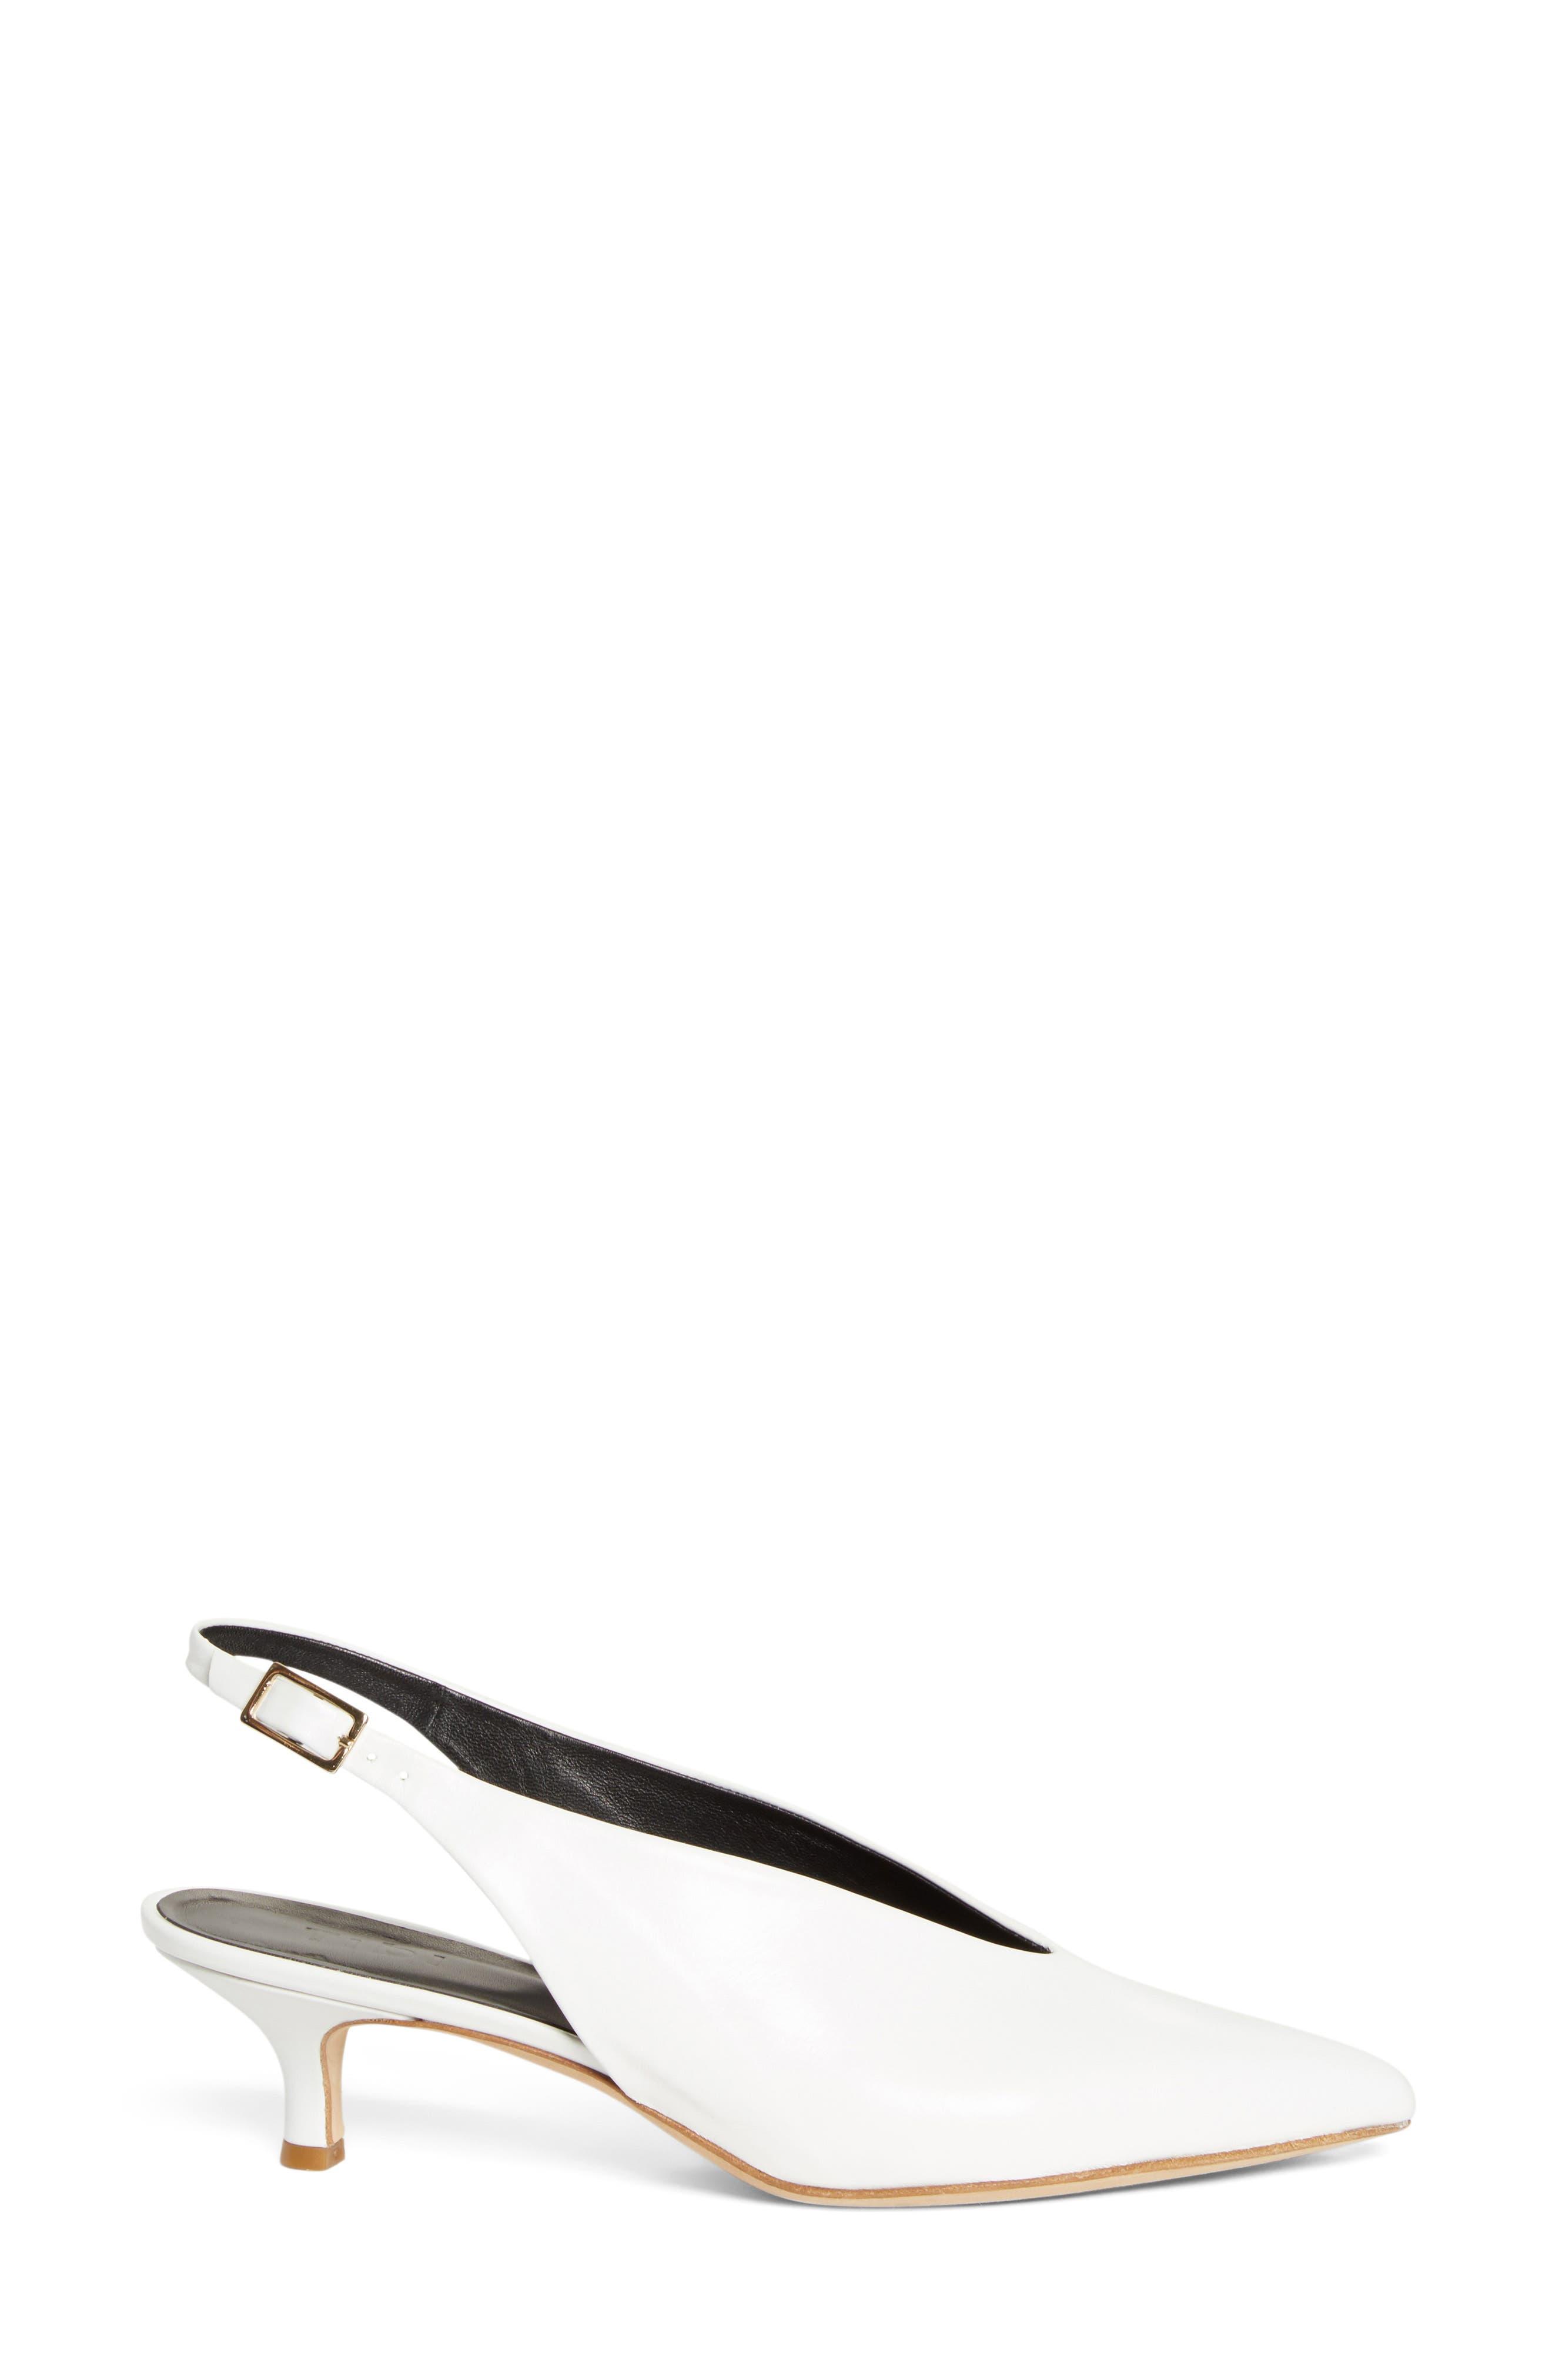 Lia Slingback Pump,                             Alternate thumbnail 3, color,                             Bright White